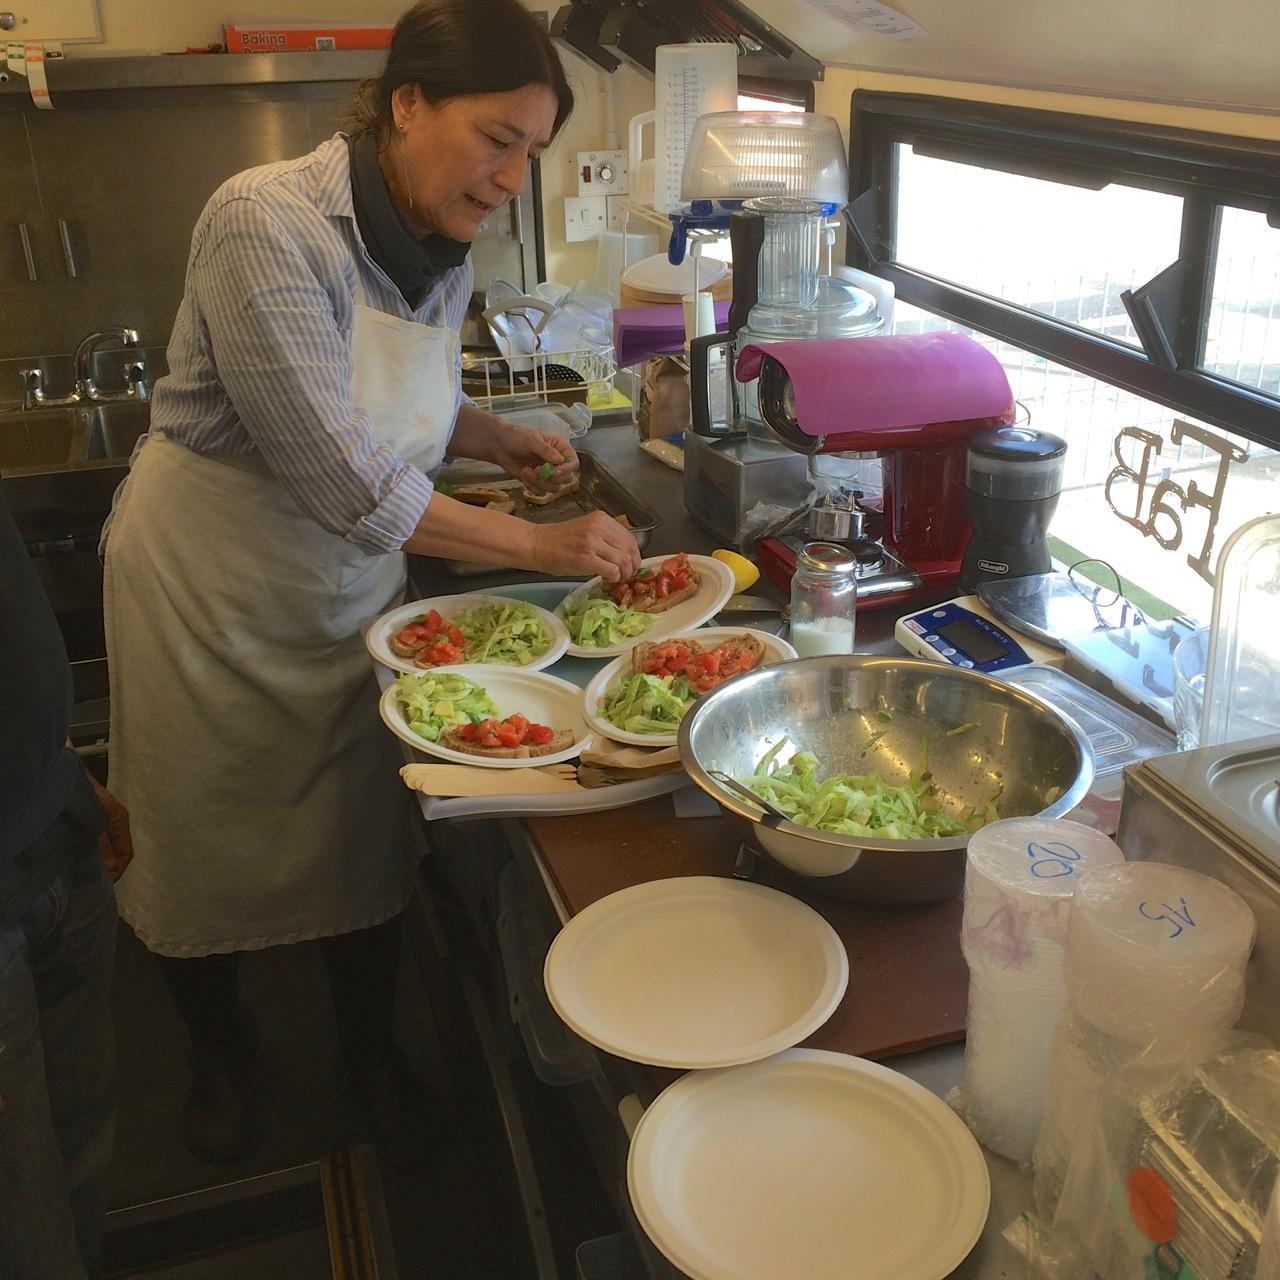 http://fatgayvegan.com/wp-content/uploads/2015/09/Chef-Myra.jpg